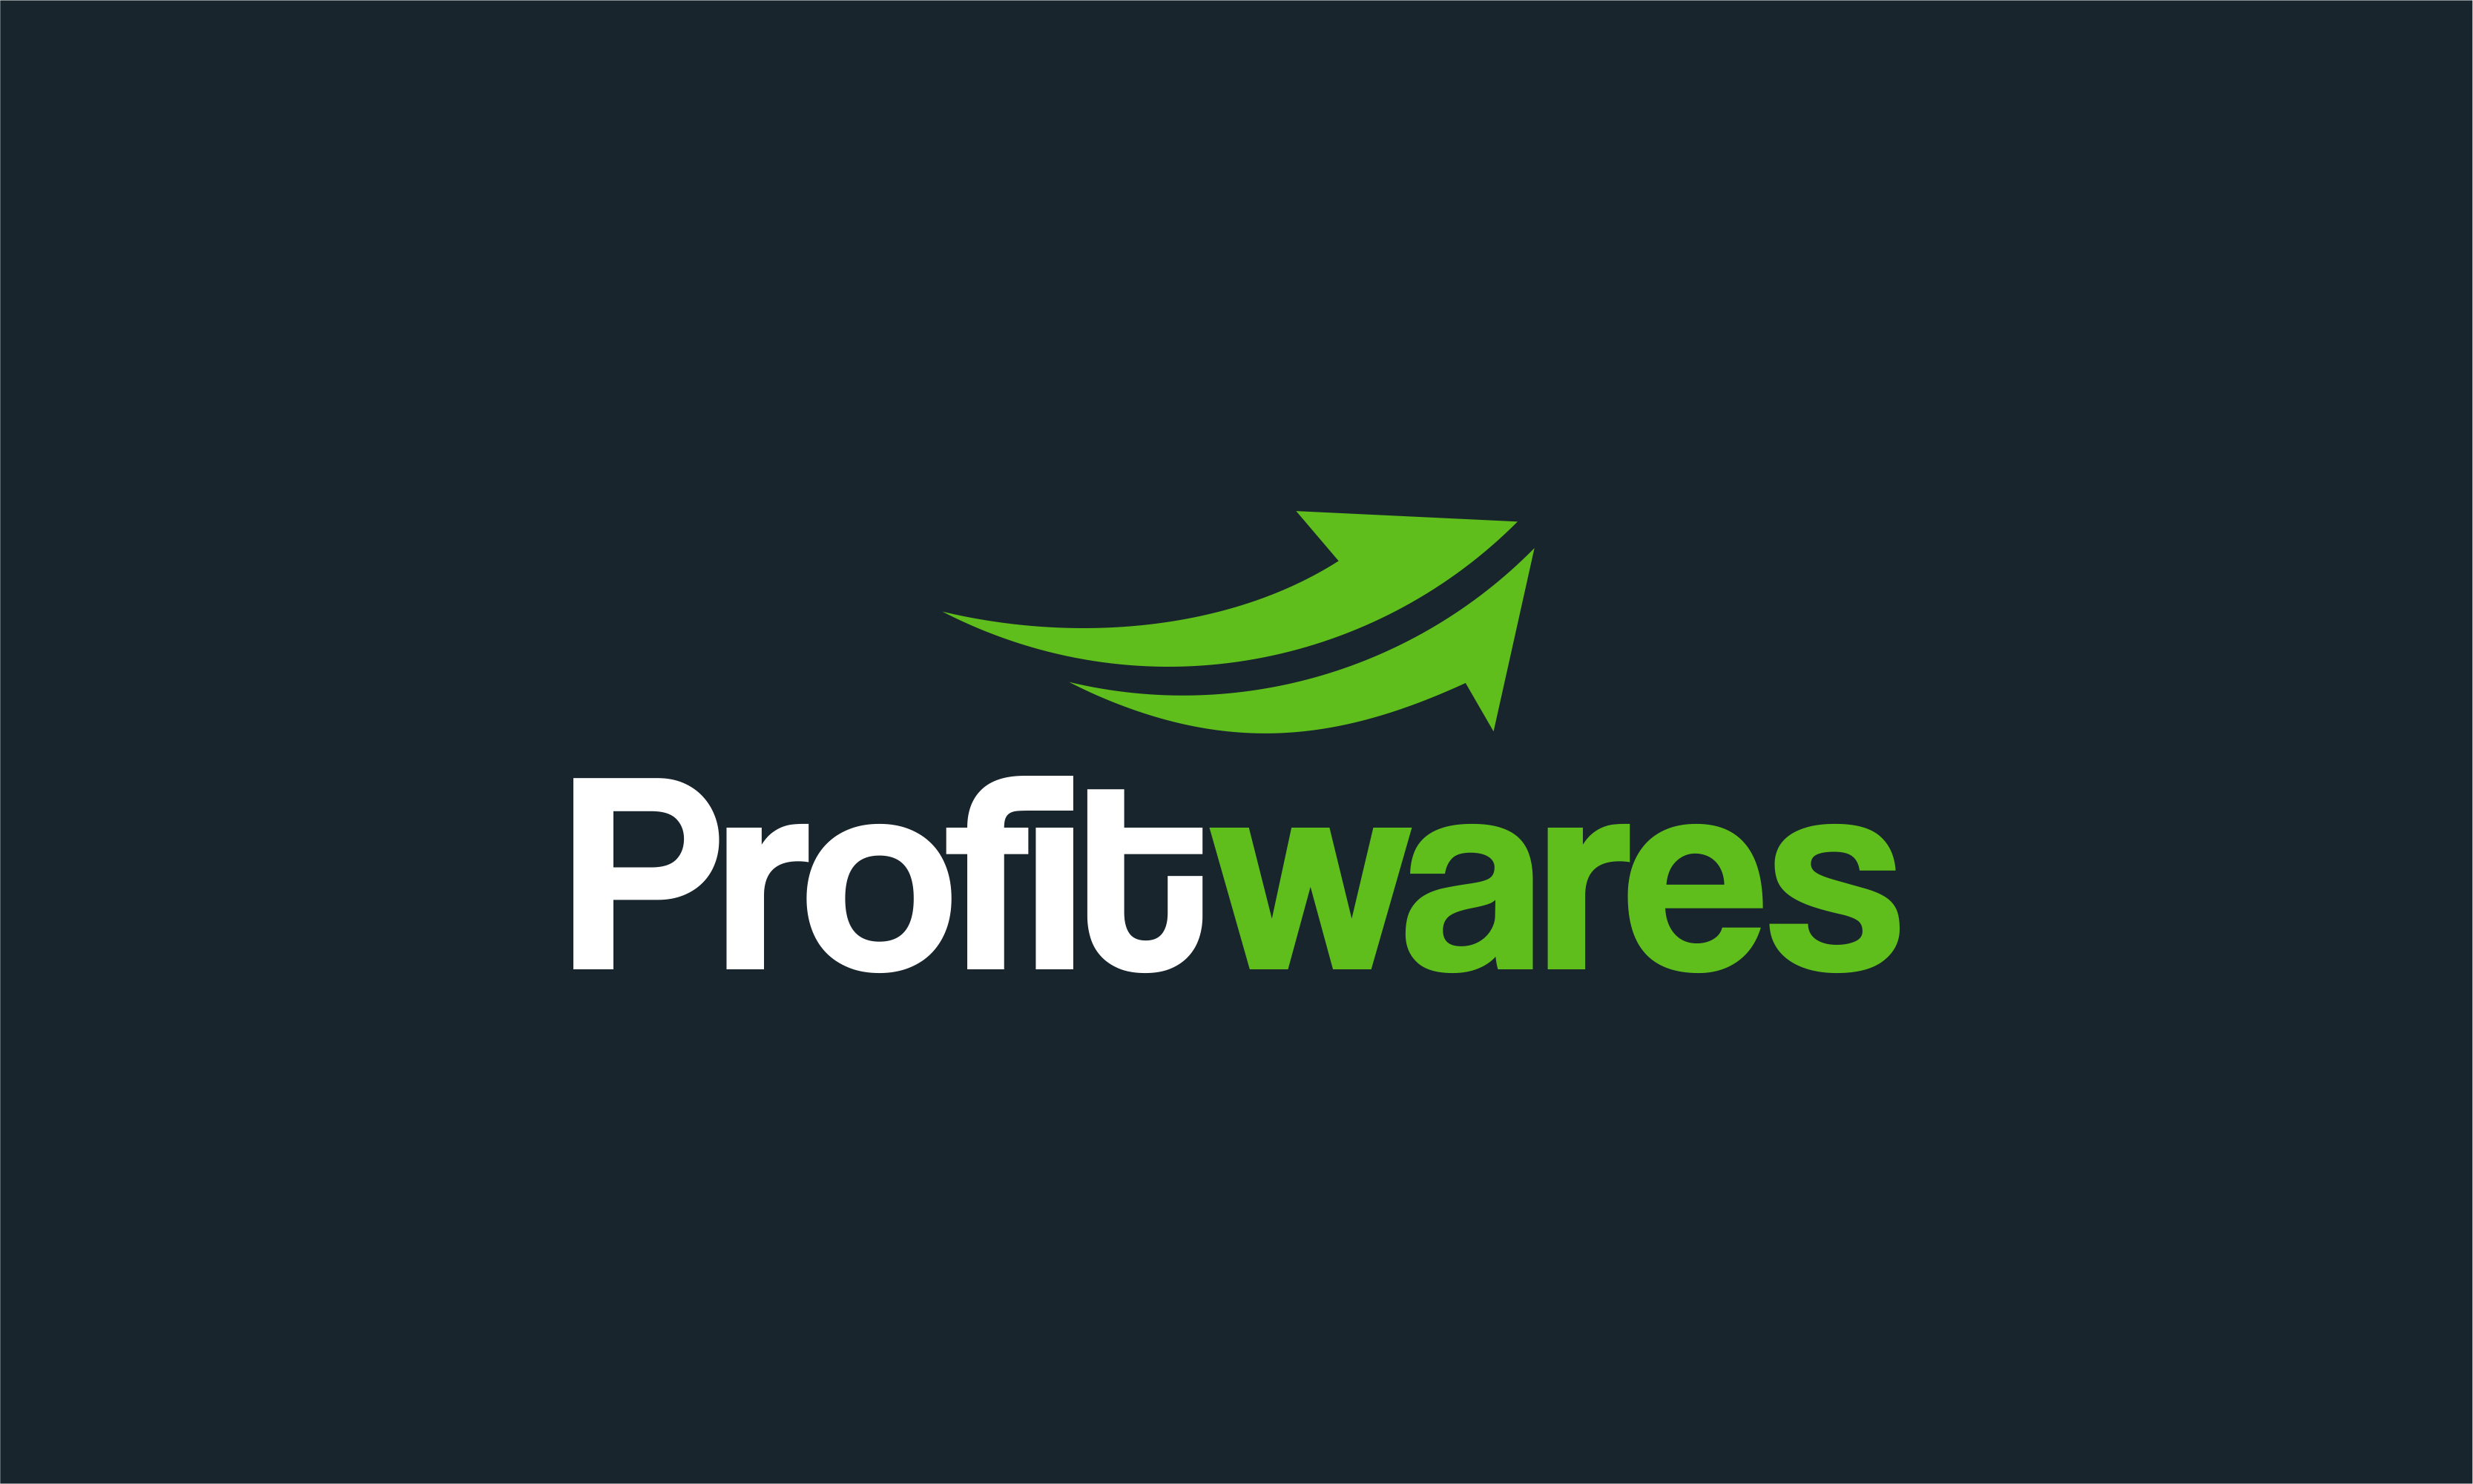 Profitwares